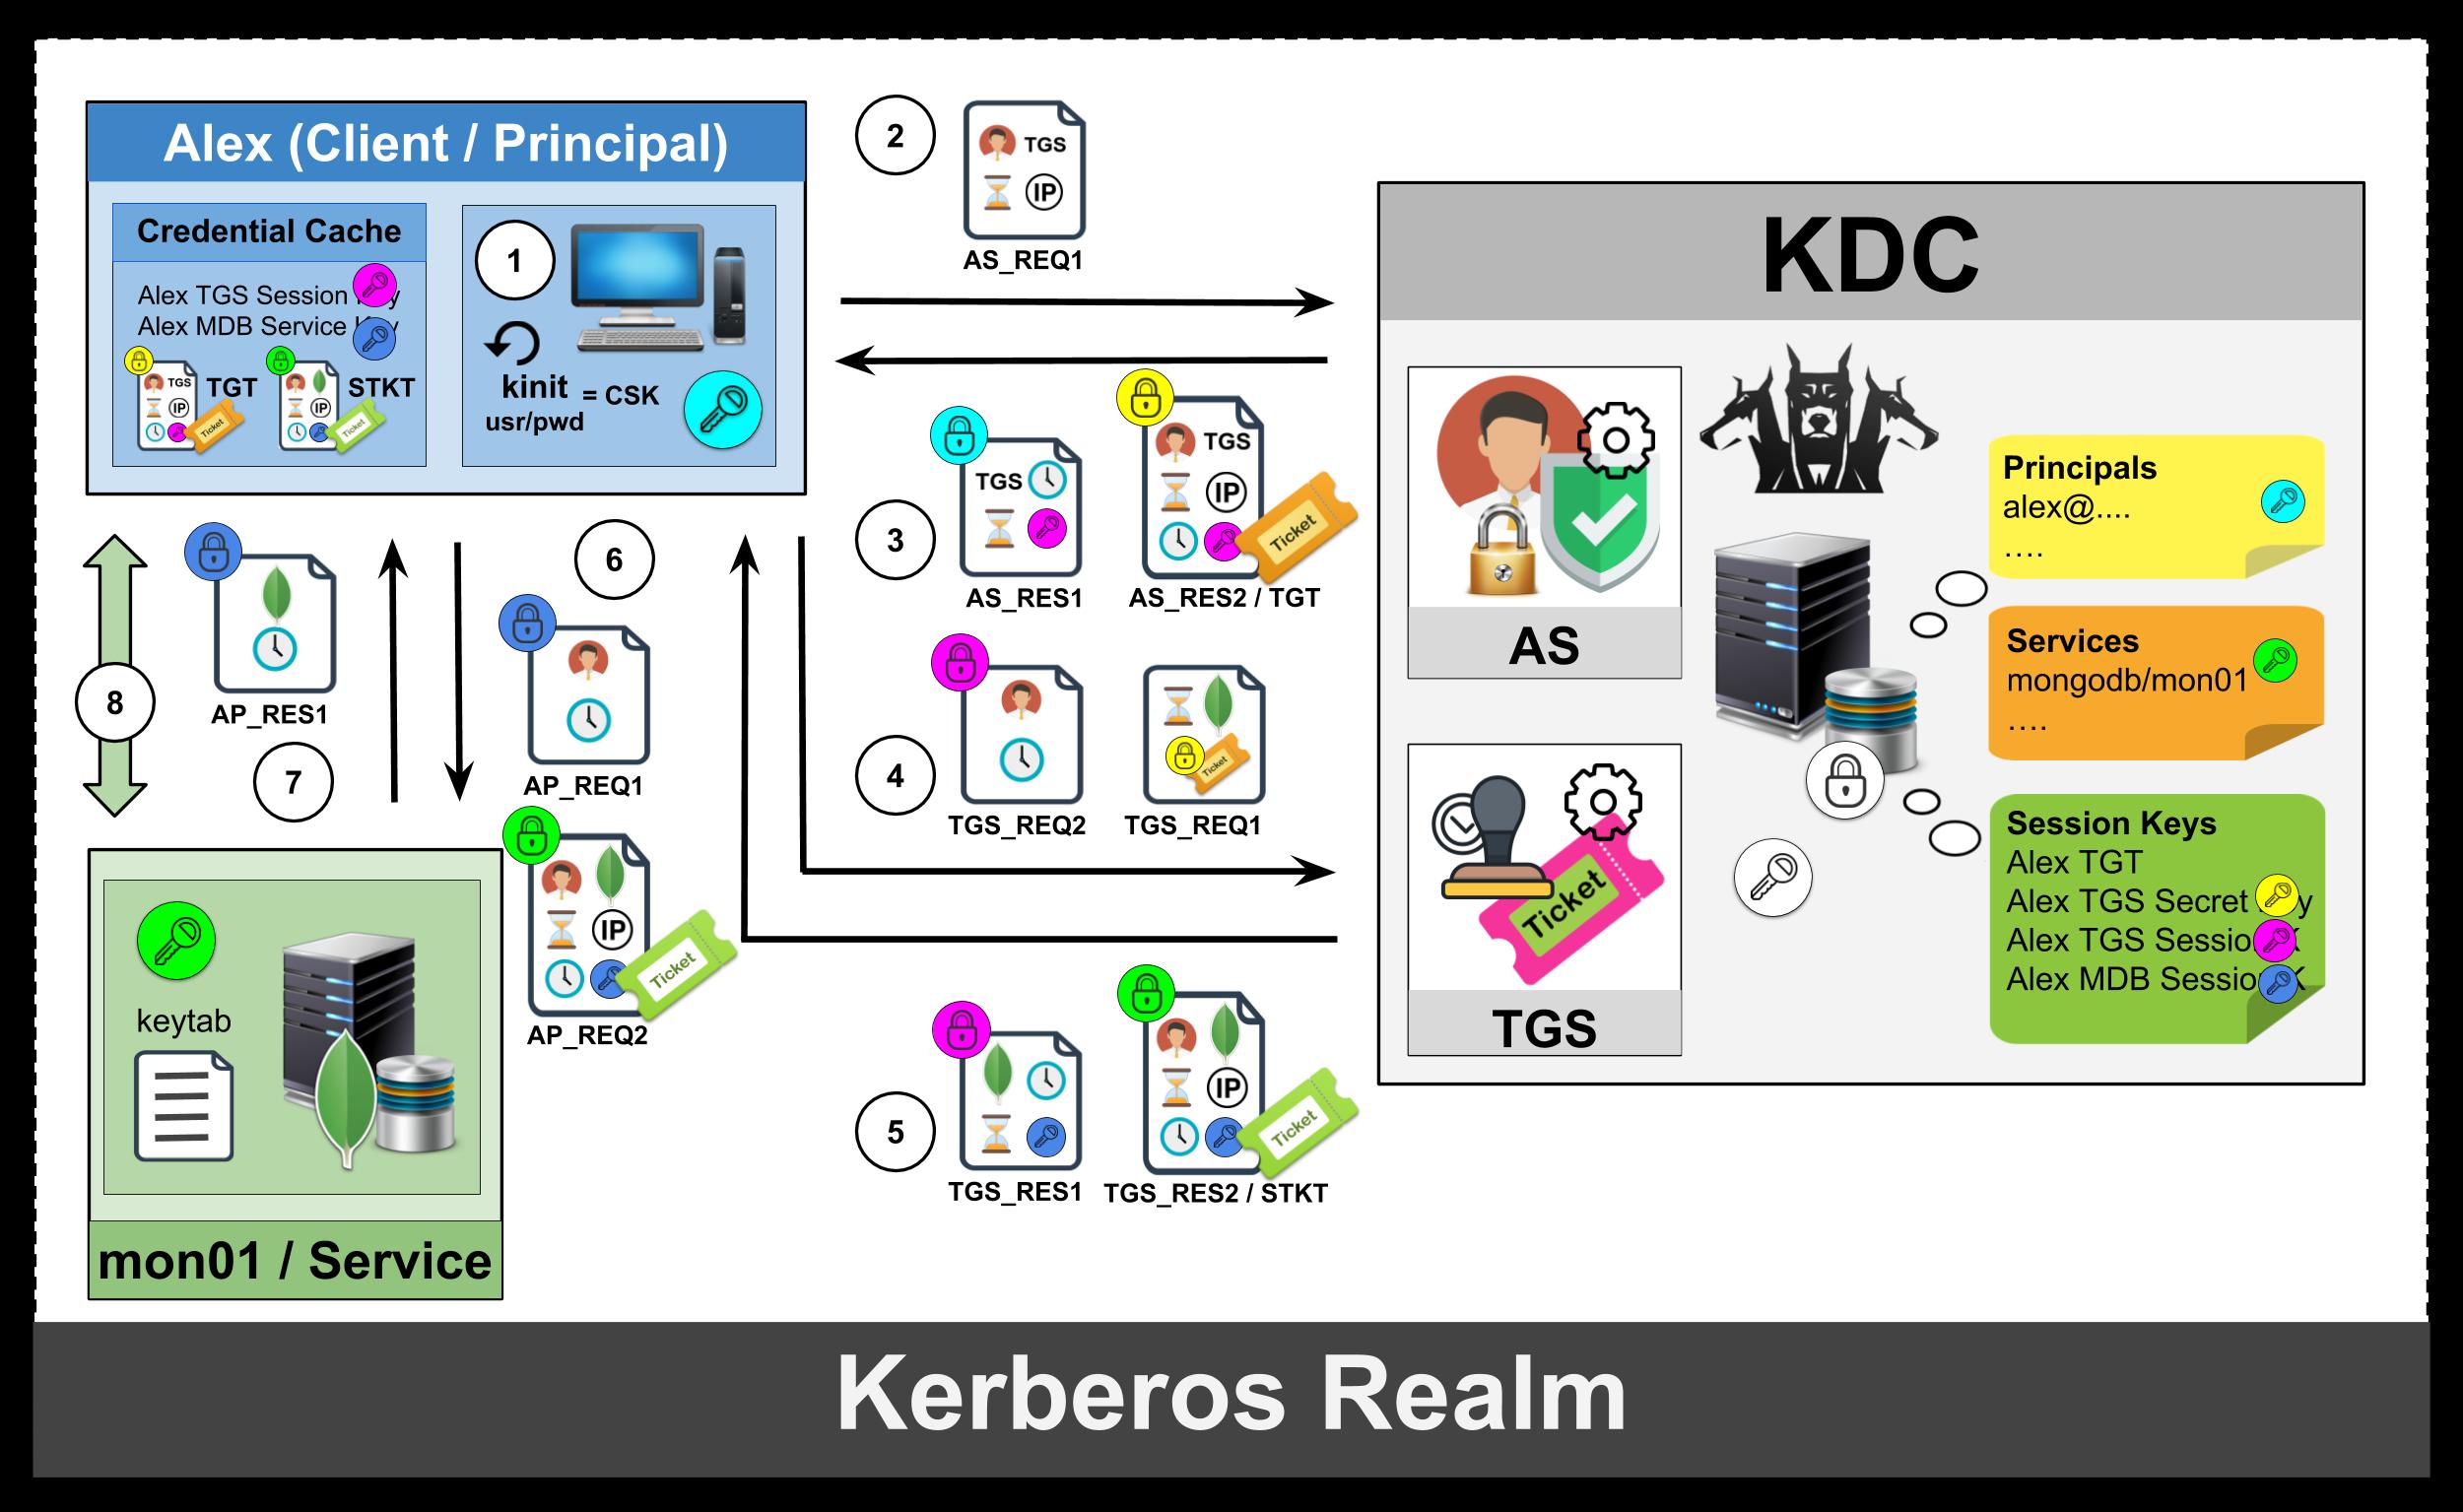 /mongodb-kerberos-a3dfdf322d1c feature image